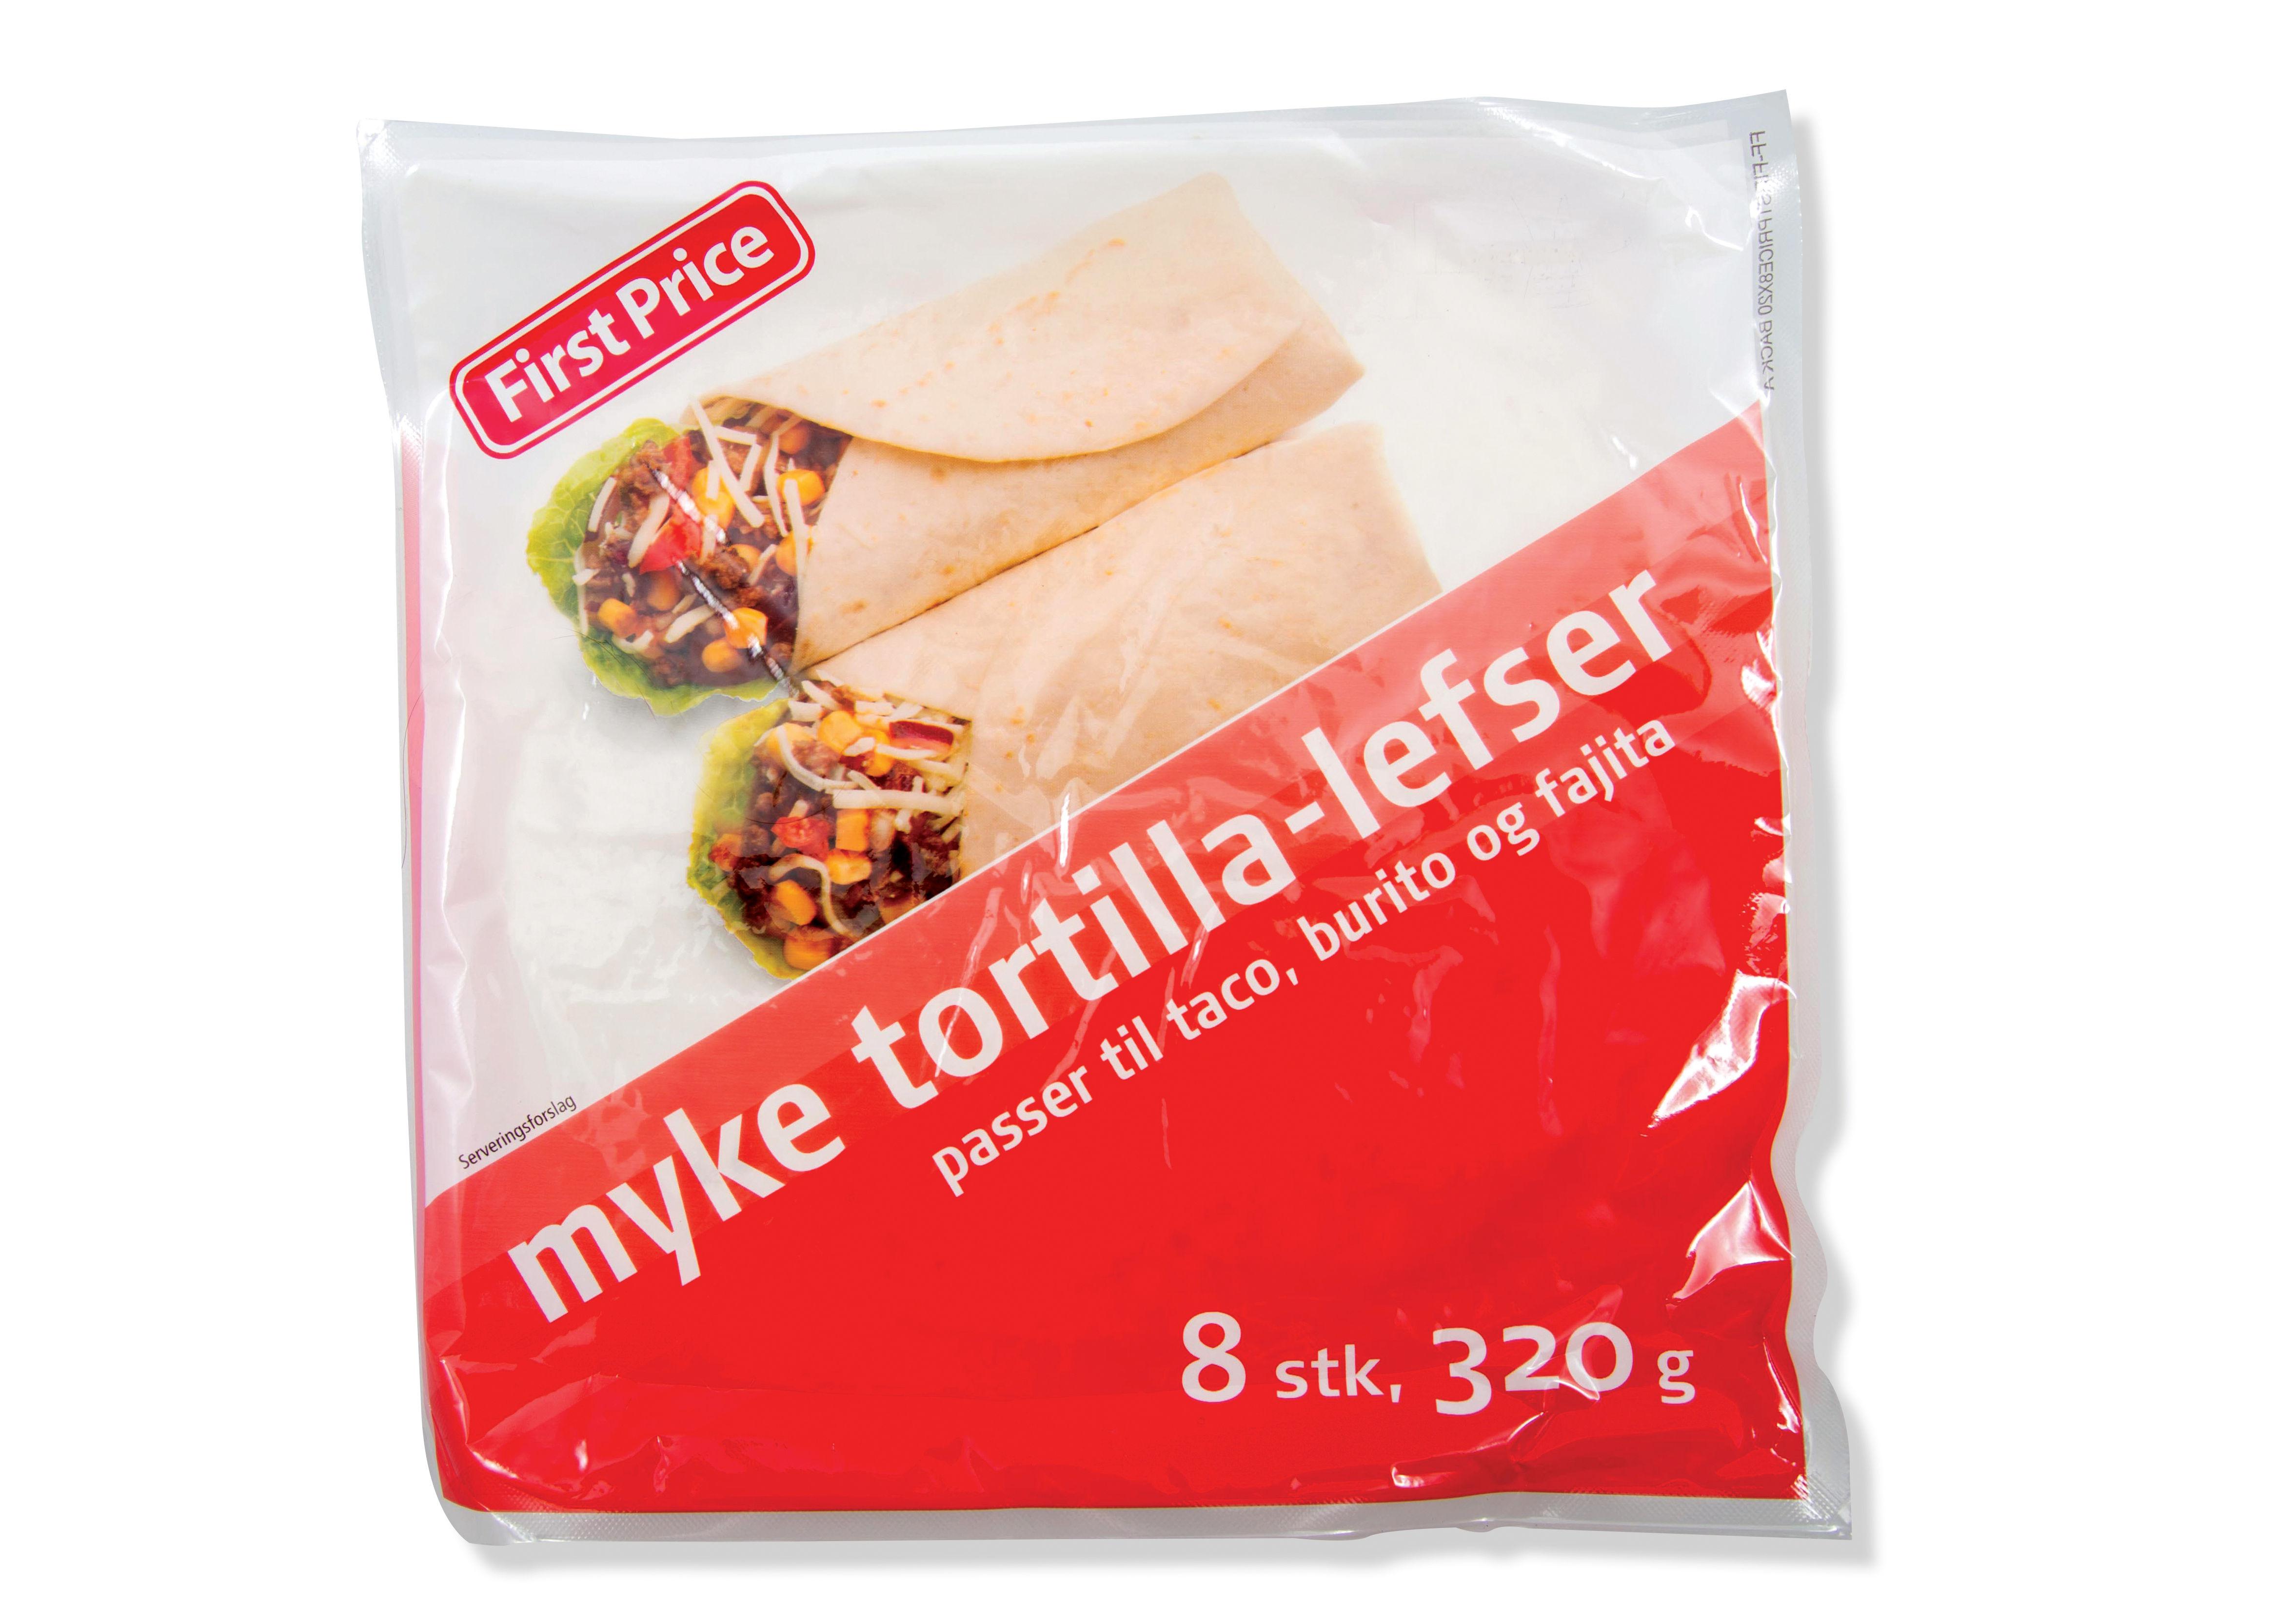 FirstPrice tortillalefser fikk masse skryt og topplassering i Dagbladets smakstest.